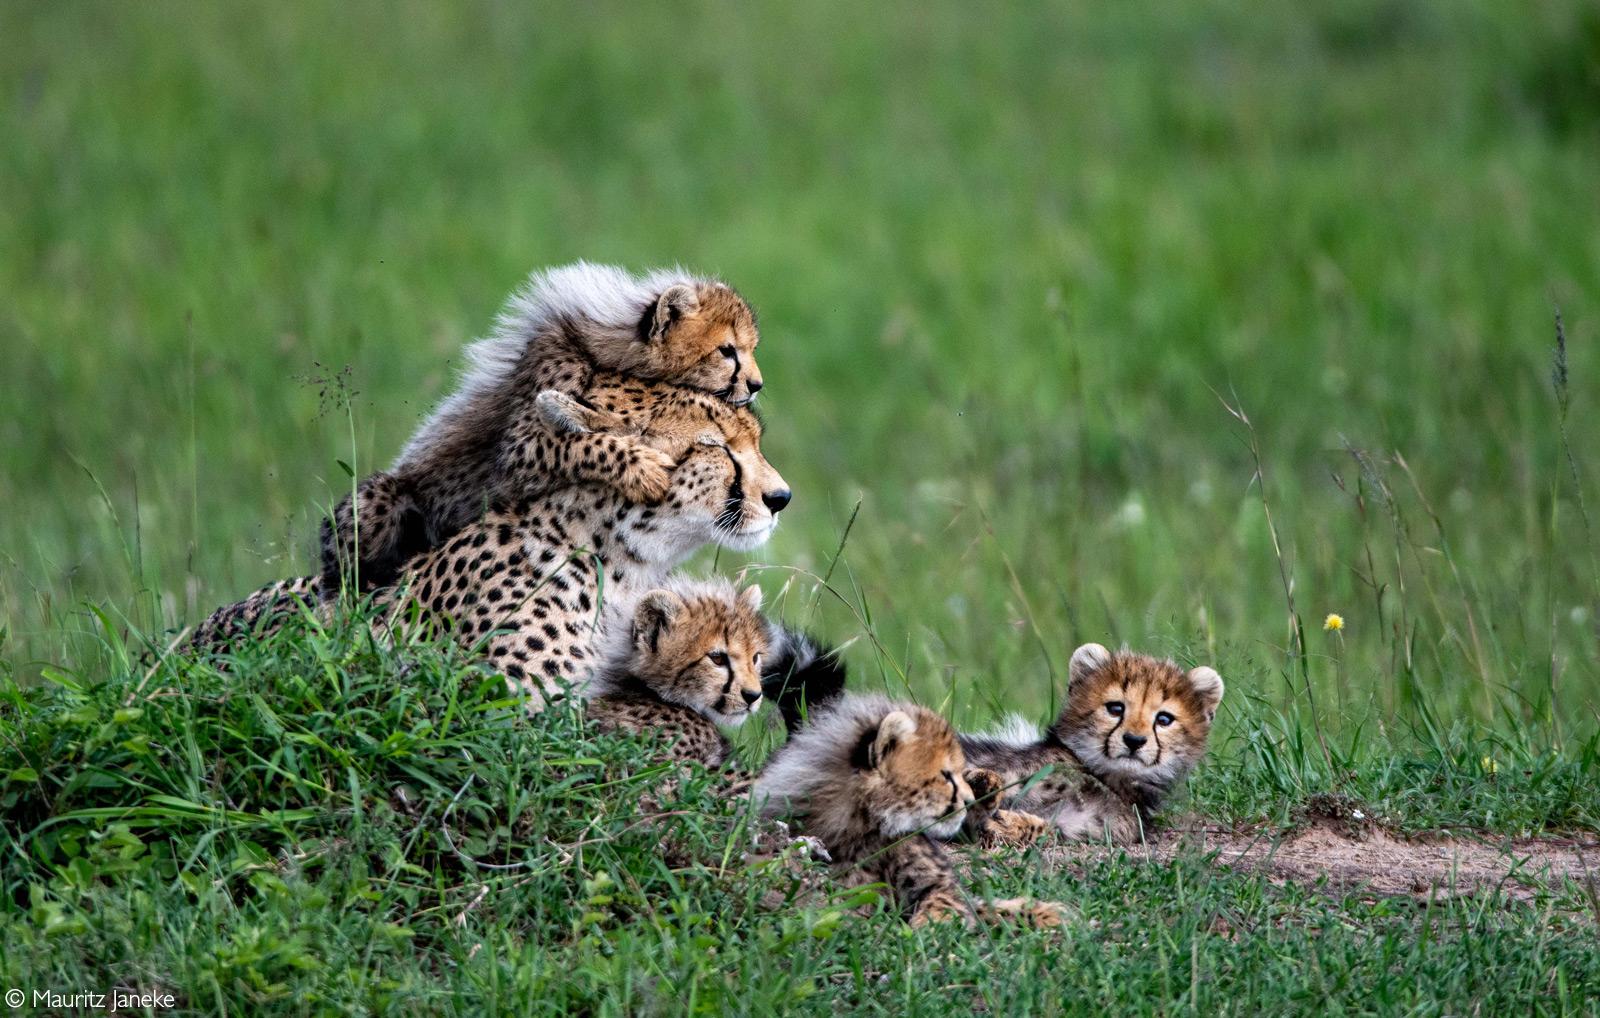 A moment captured with Siligi the cheetah and four of her seven cubs. Maasai Mara National Reserve, Kenya © Mauritz Janeke